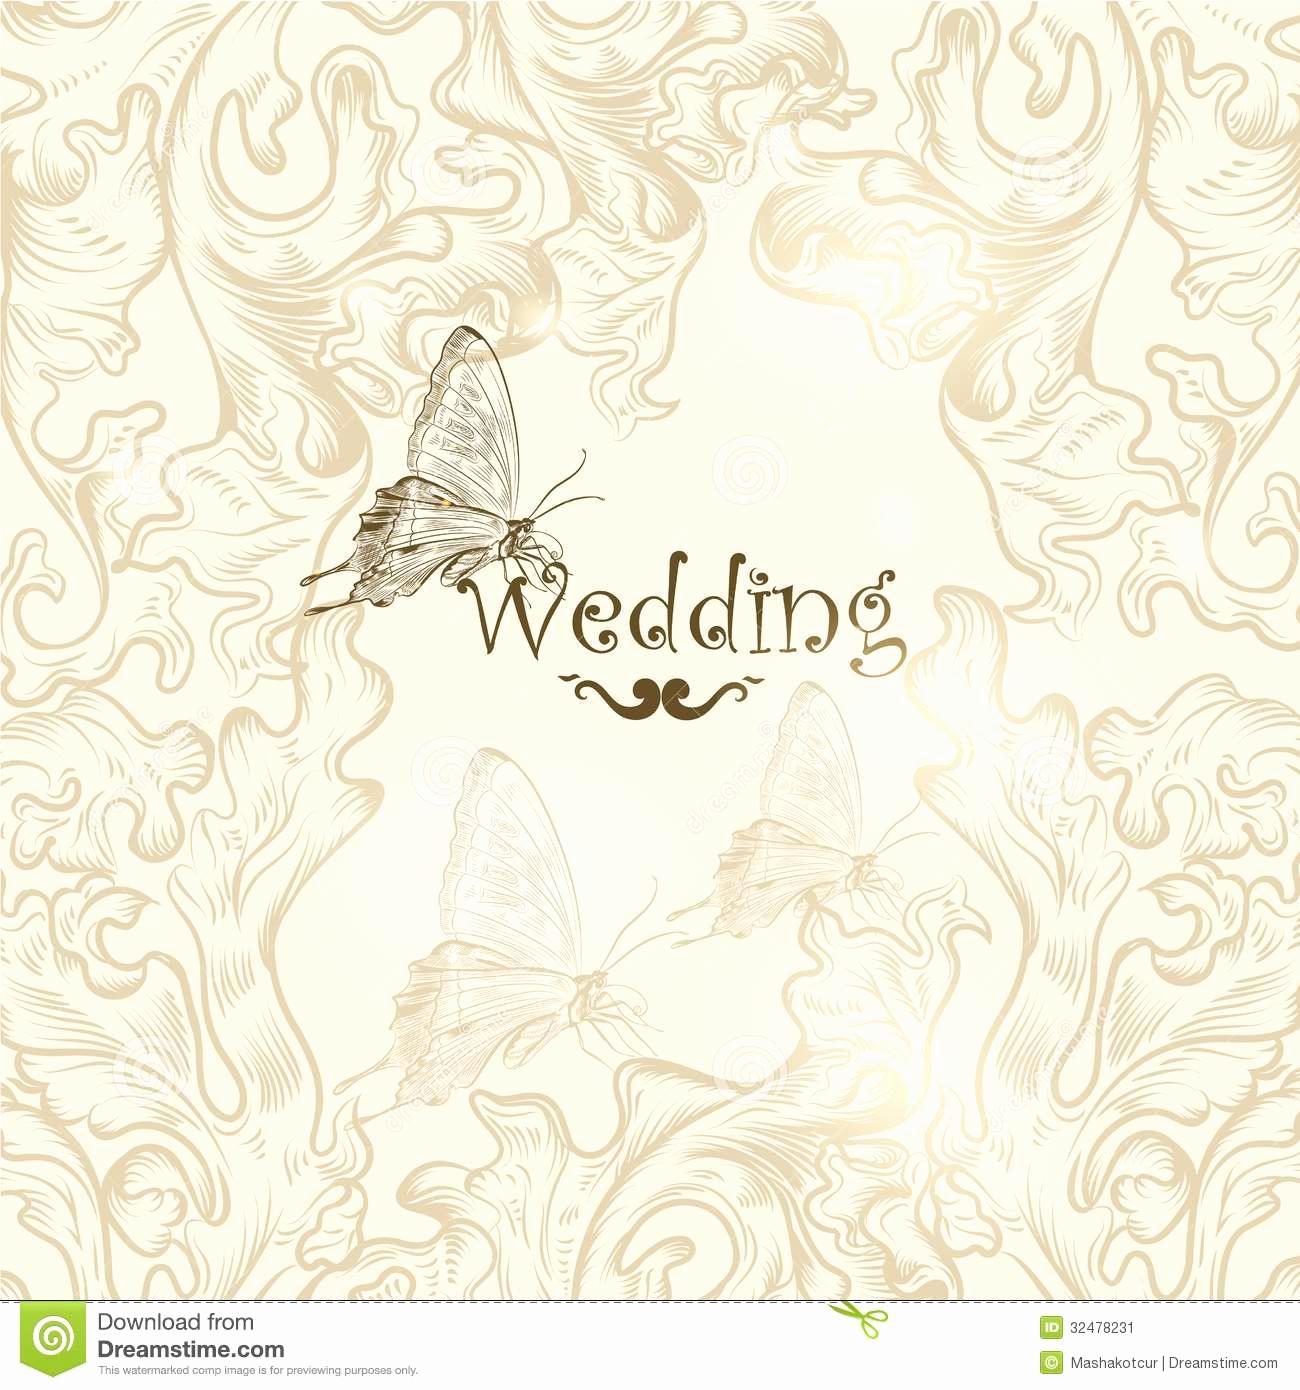 Wedding Invitation Background Designs Inspirational Cute Wedding Background for Design Stock Vector